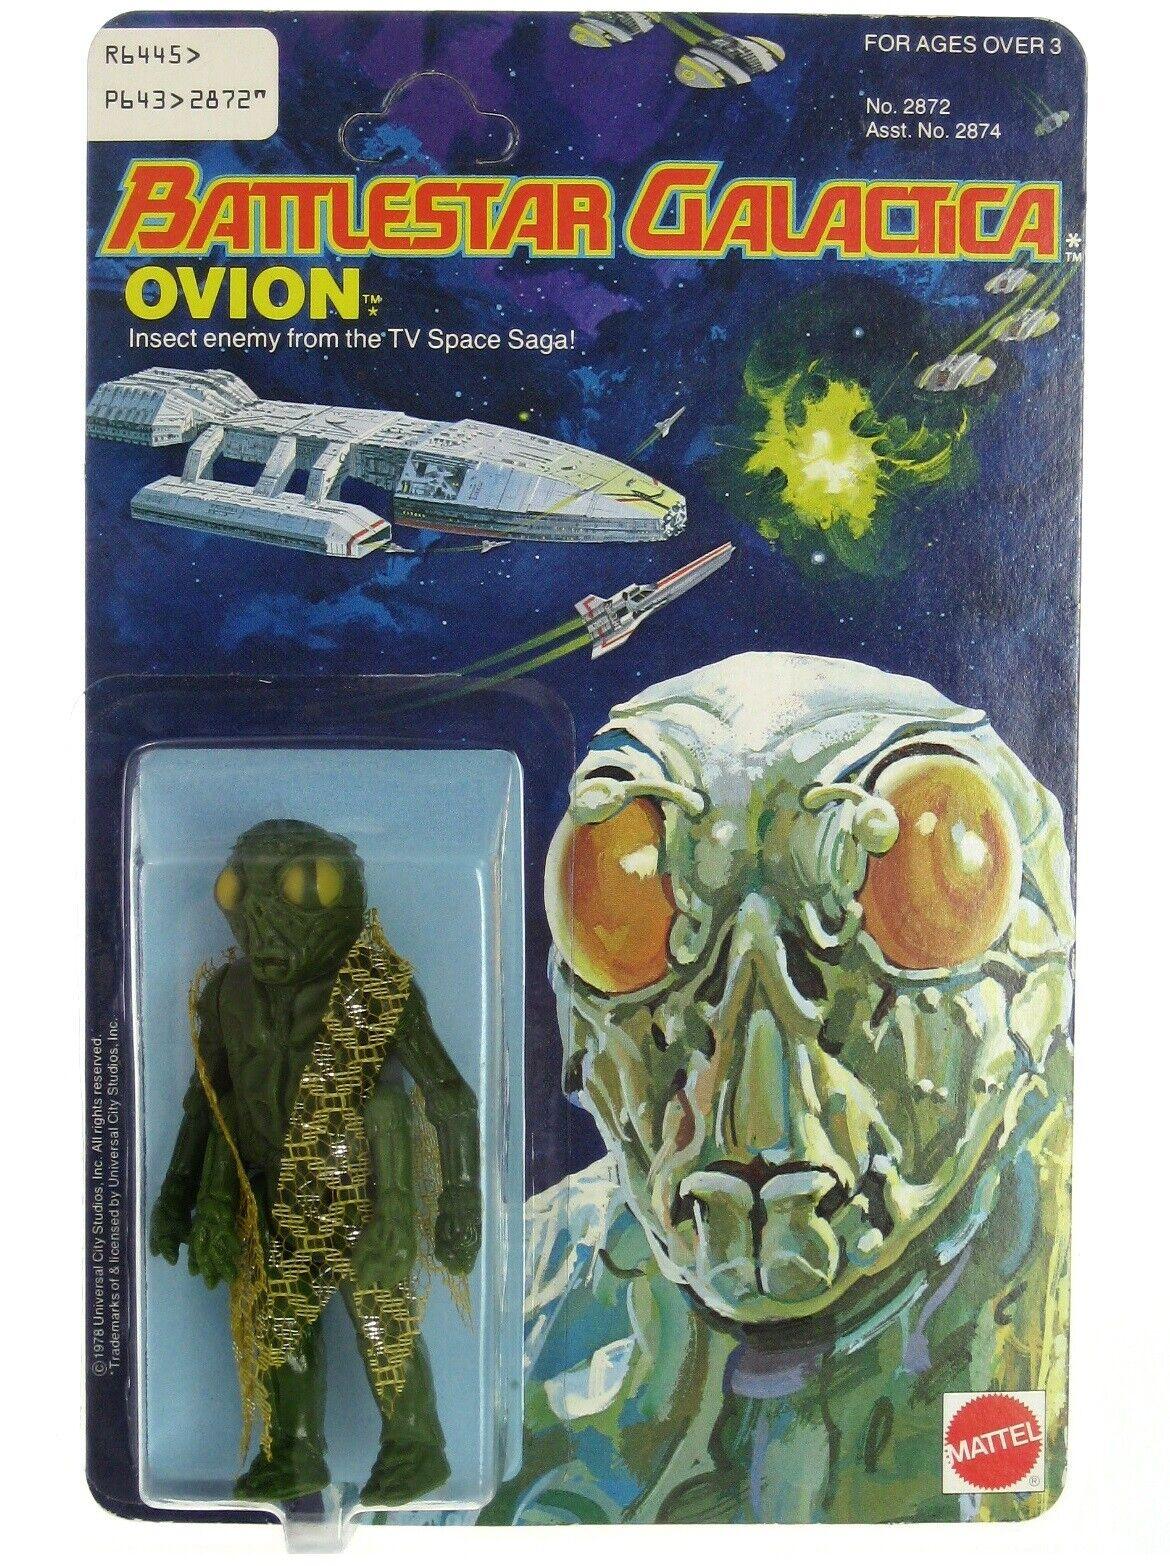 Vintage 1978 Mattel Battlestar Galactica Ovion Alien Sealed Mint on Card UNP MOC